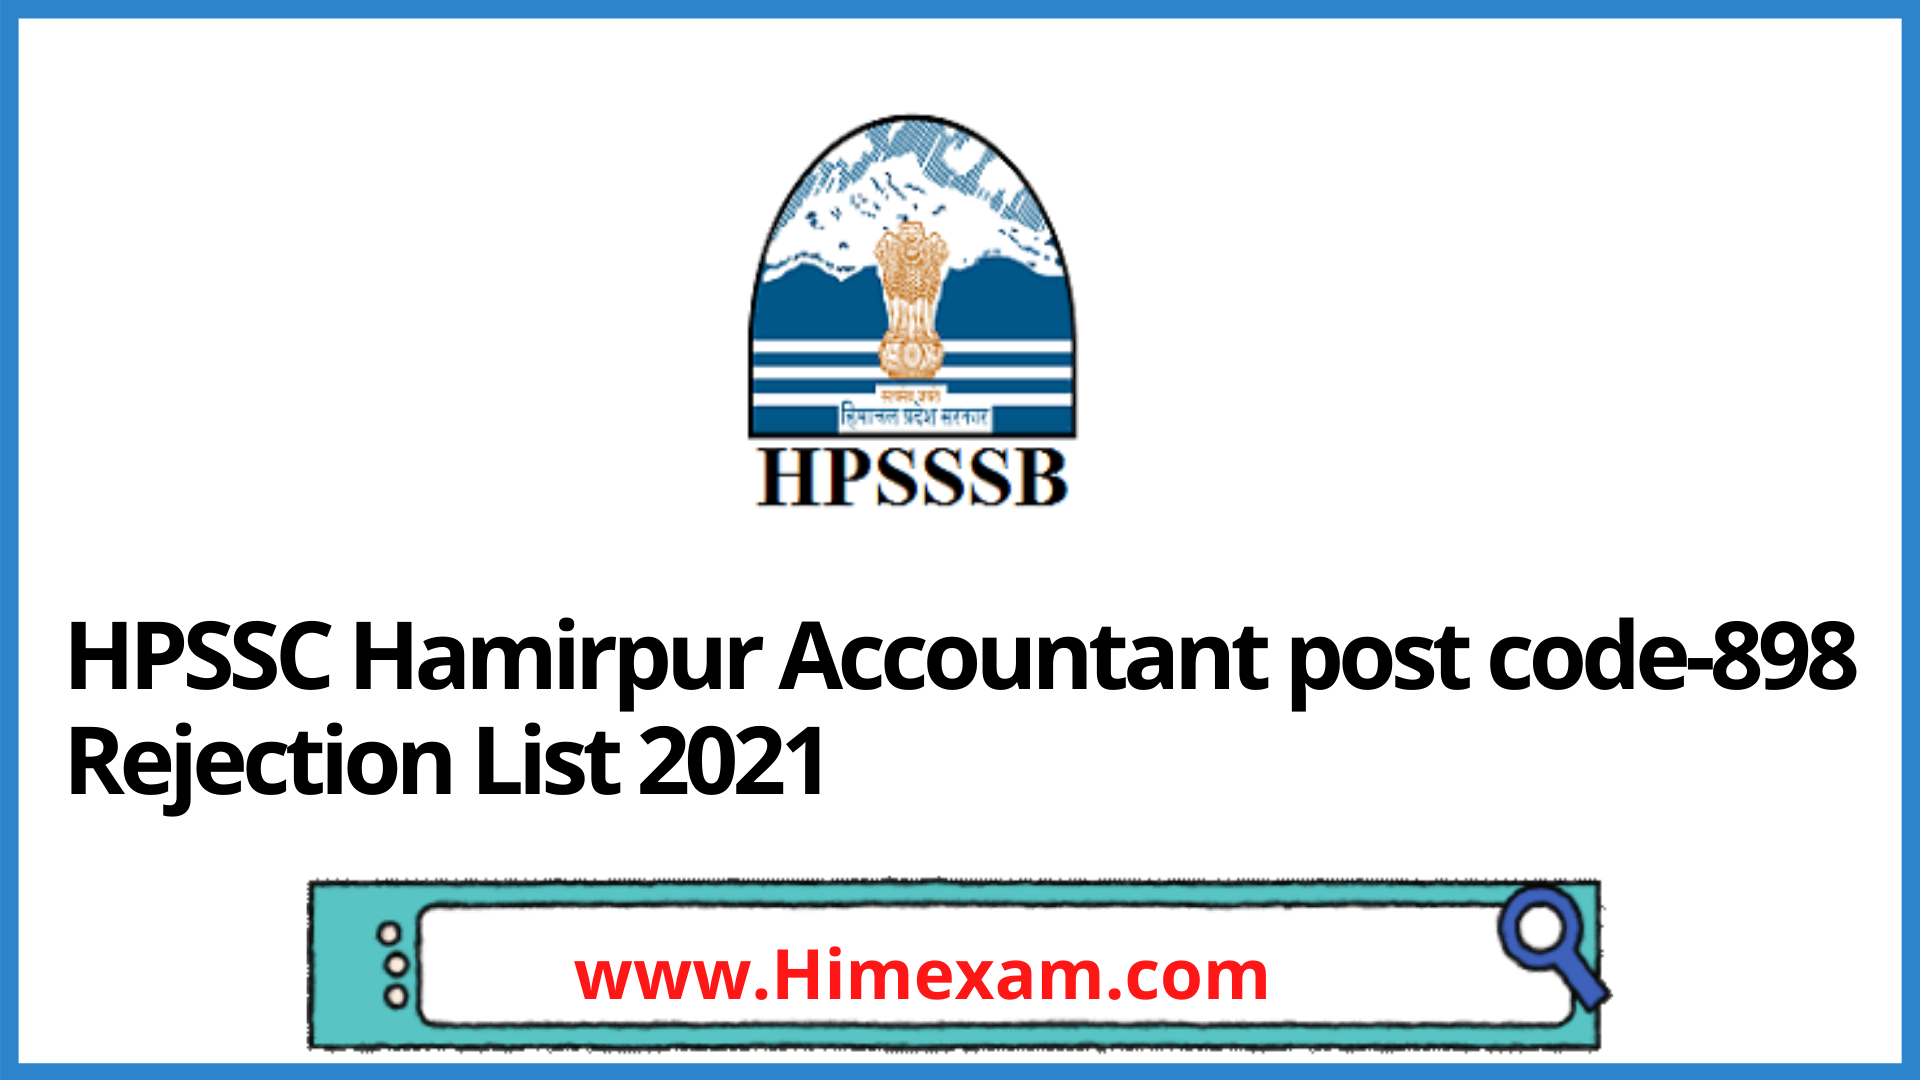 HPSSC Hamirpur Accountant post code-898 Rejection List 2021